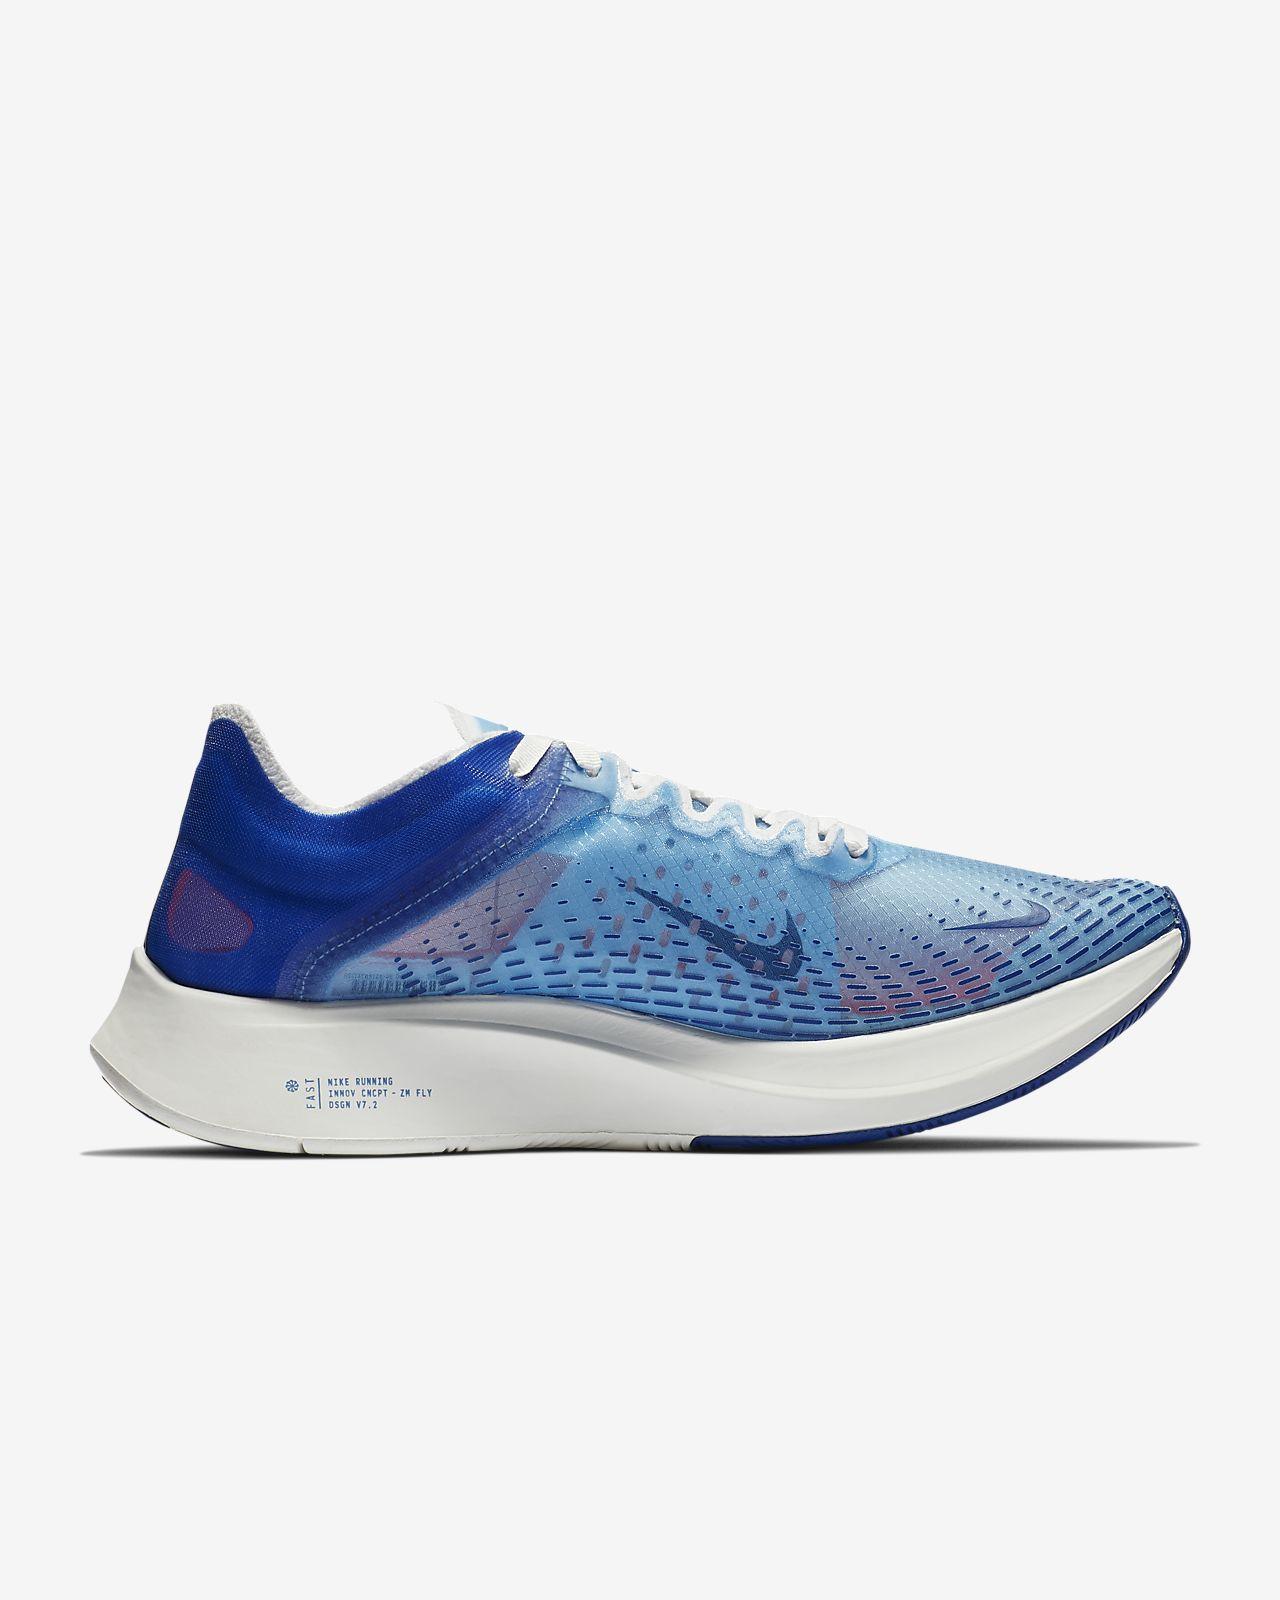 bee6e453a63a7 Dámský běžecká bota Nike Zoom Fly SP Fast. Nike.com CZ